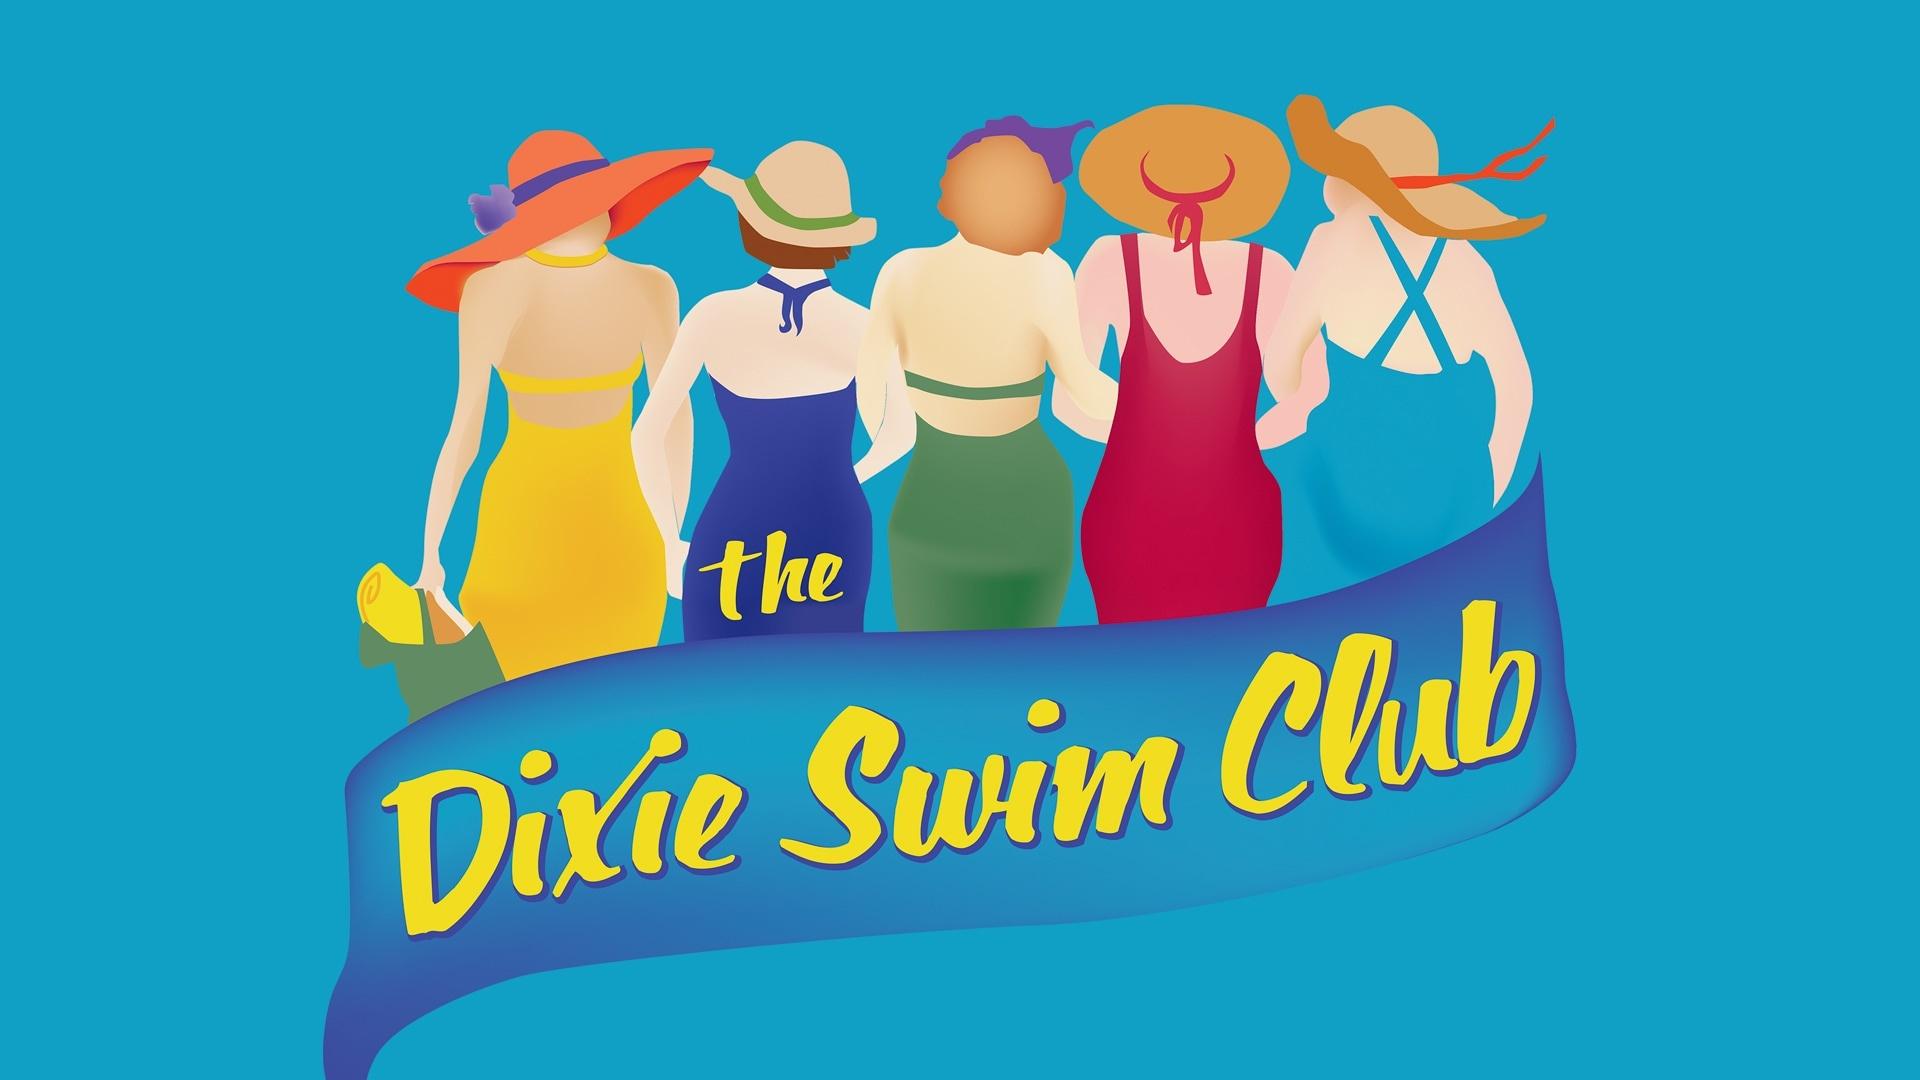 the Dixie Swim Club - show graphic